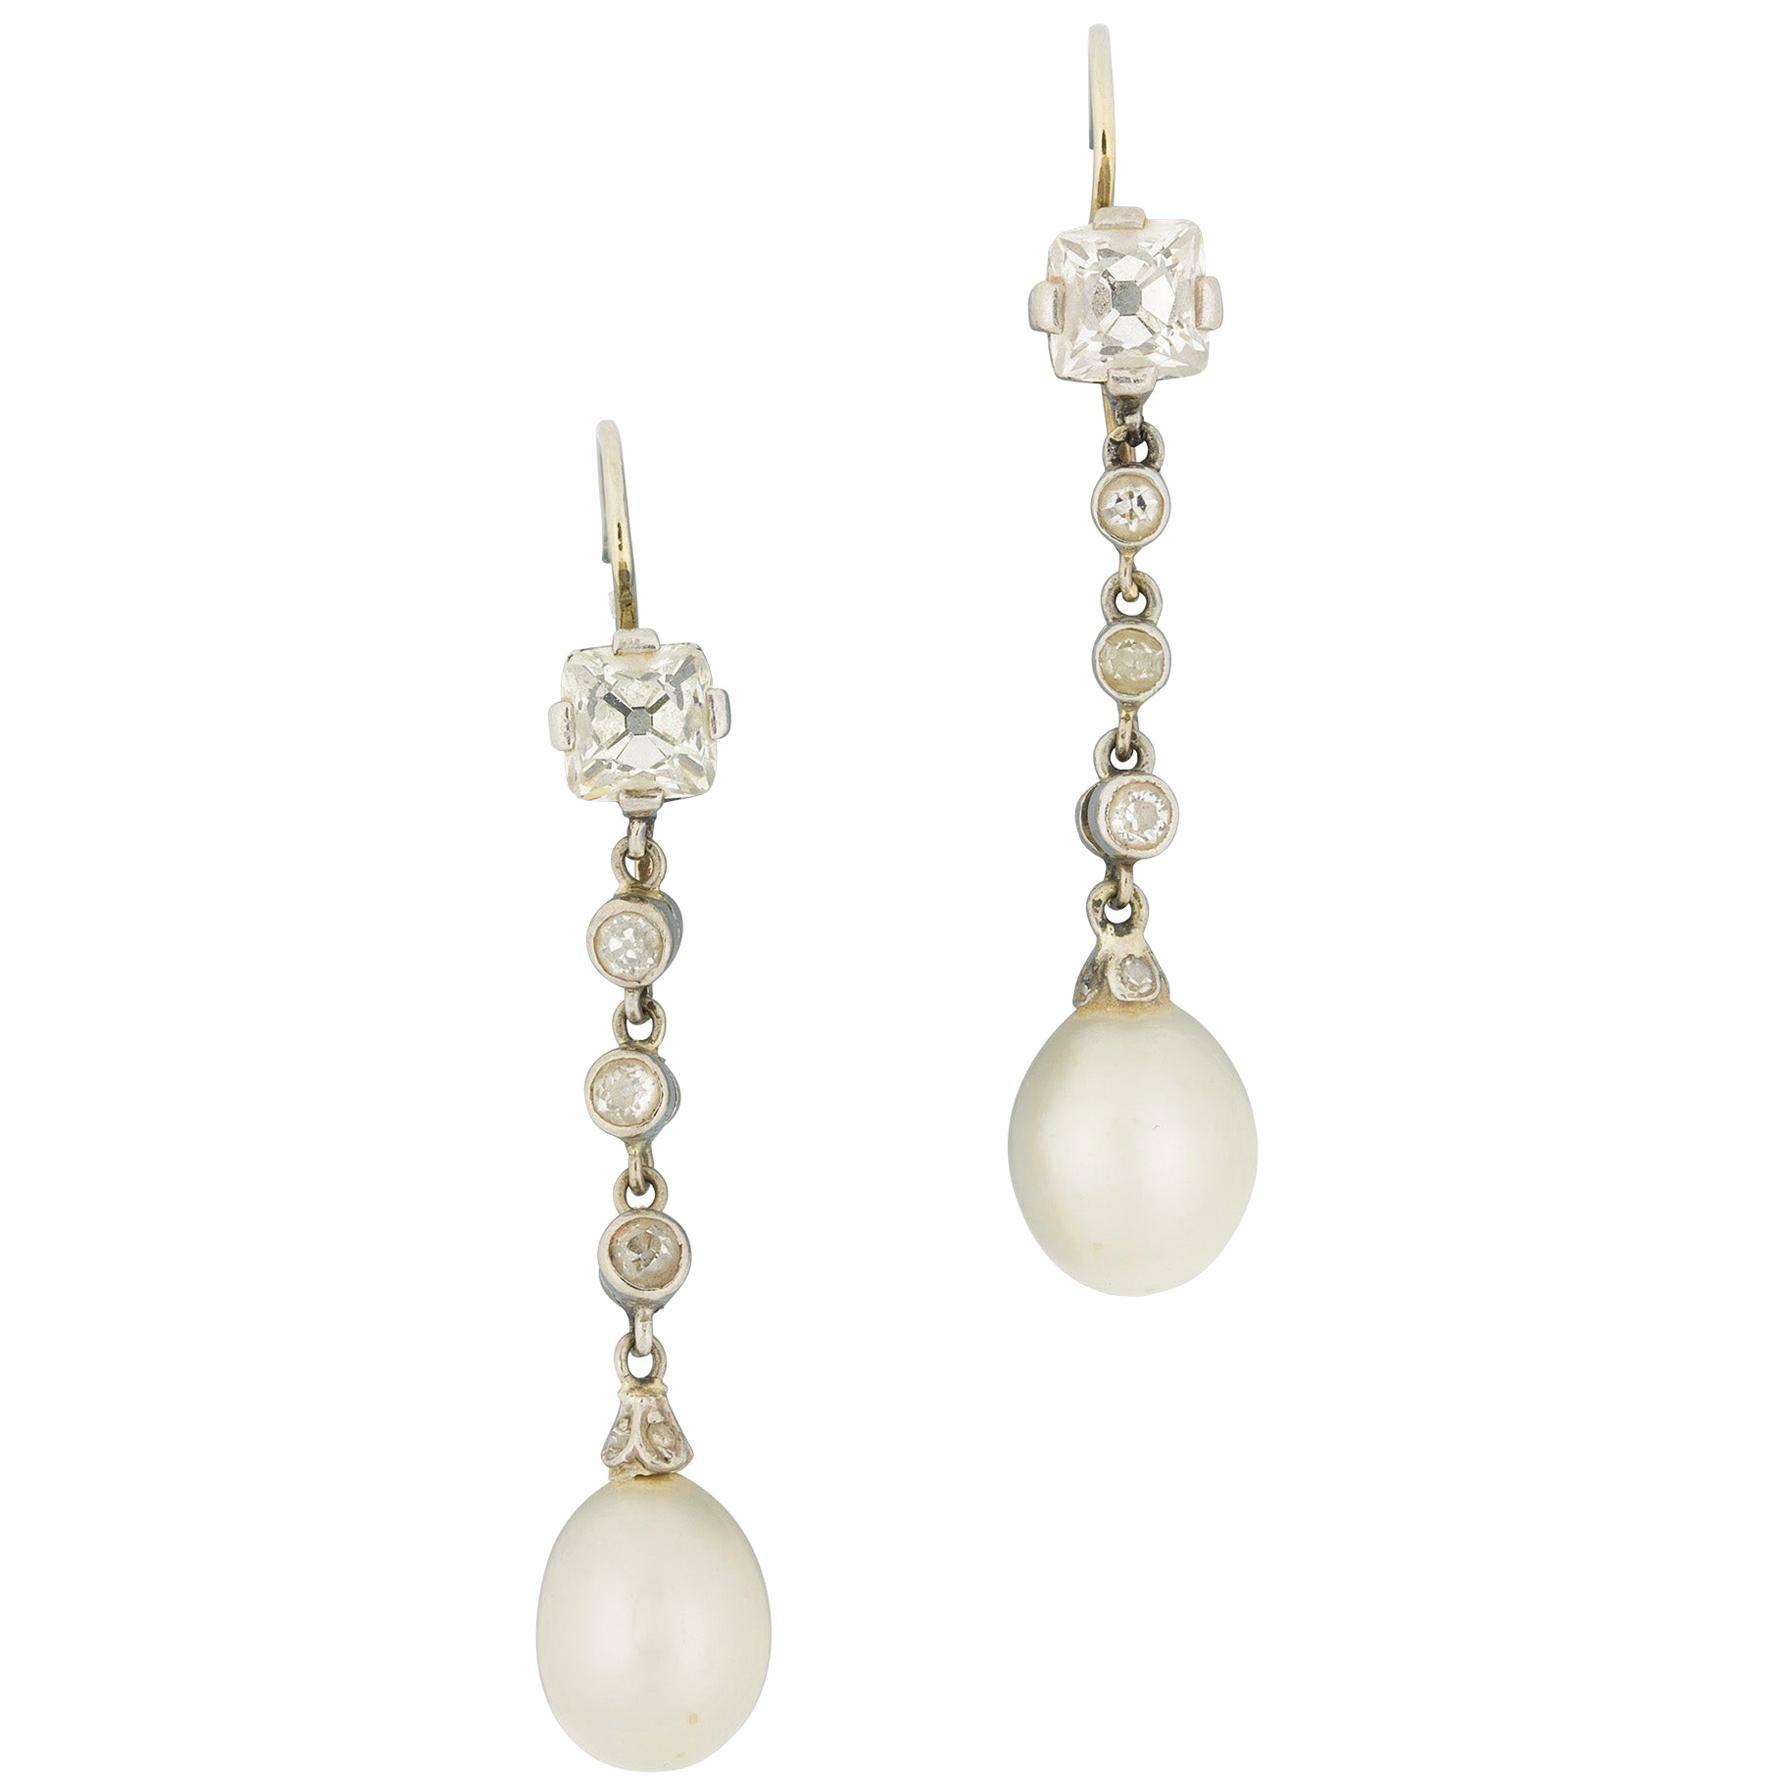 Pair of Natural Pearl and Diamond Ear Pendants